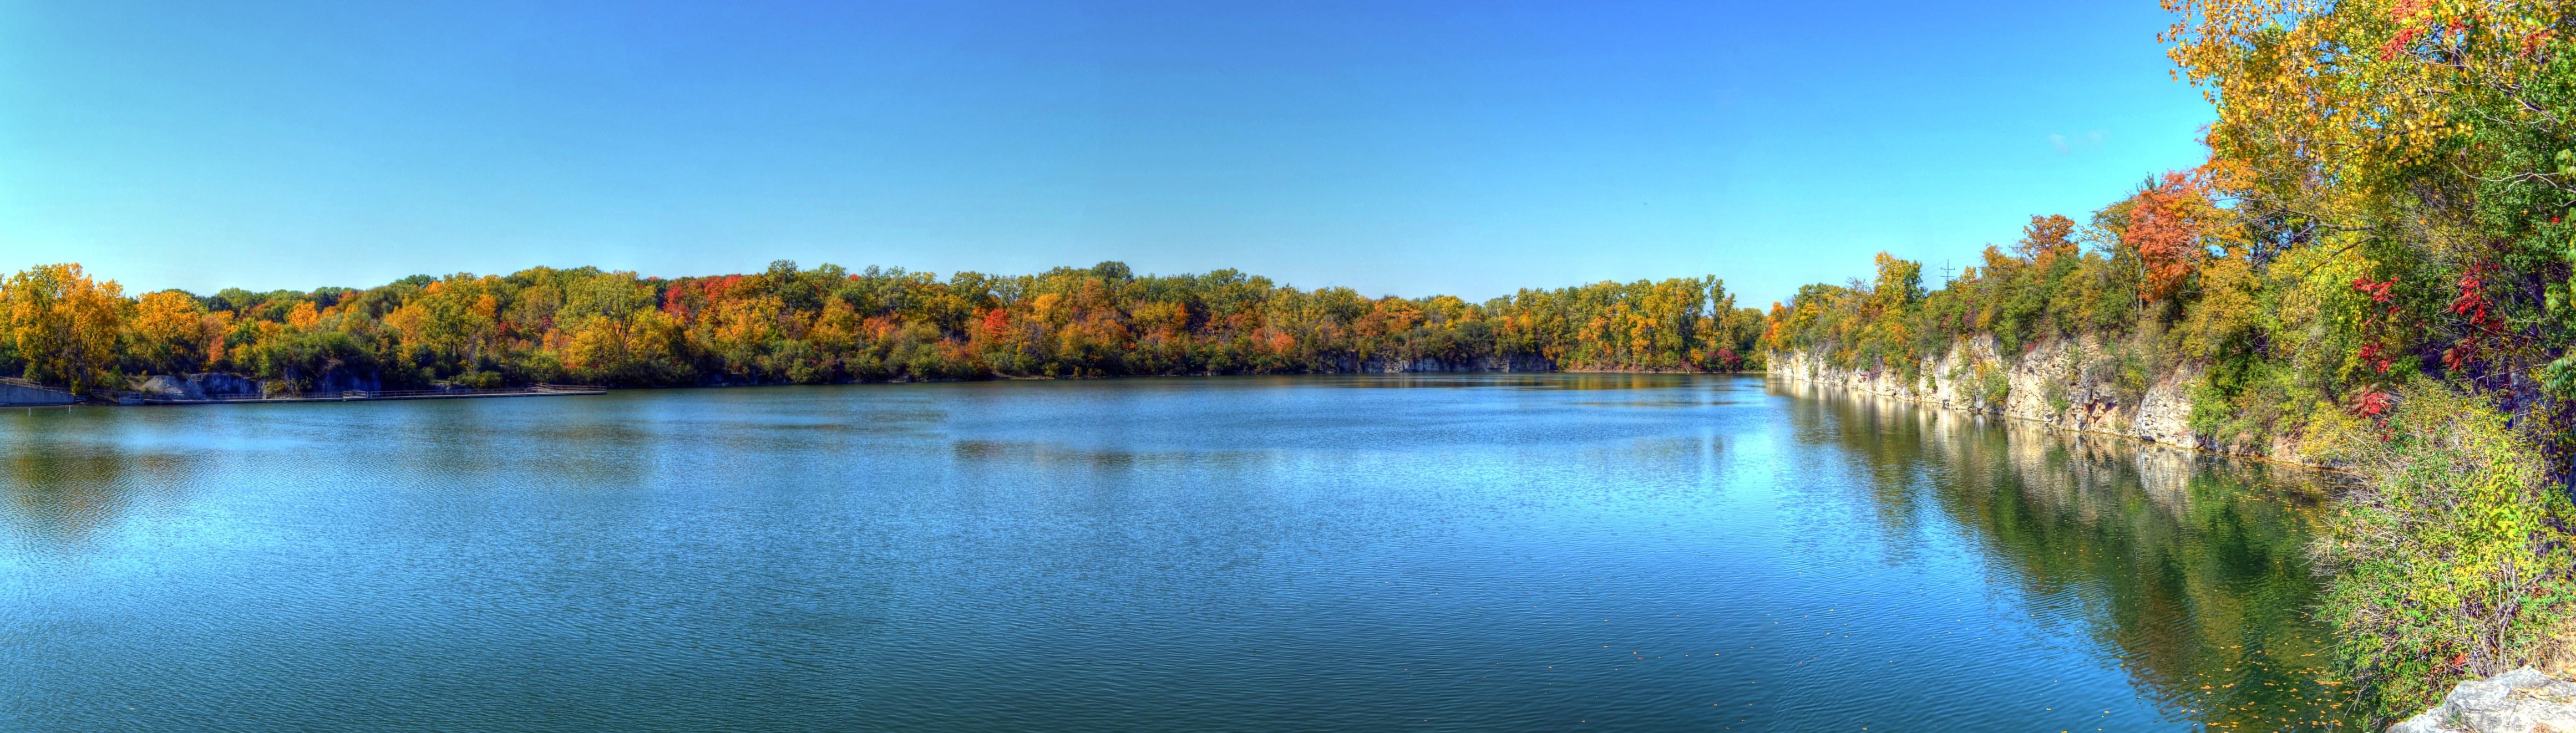 Quarry Lake Park 2